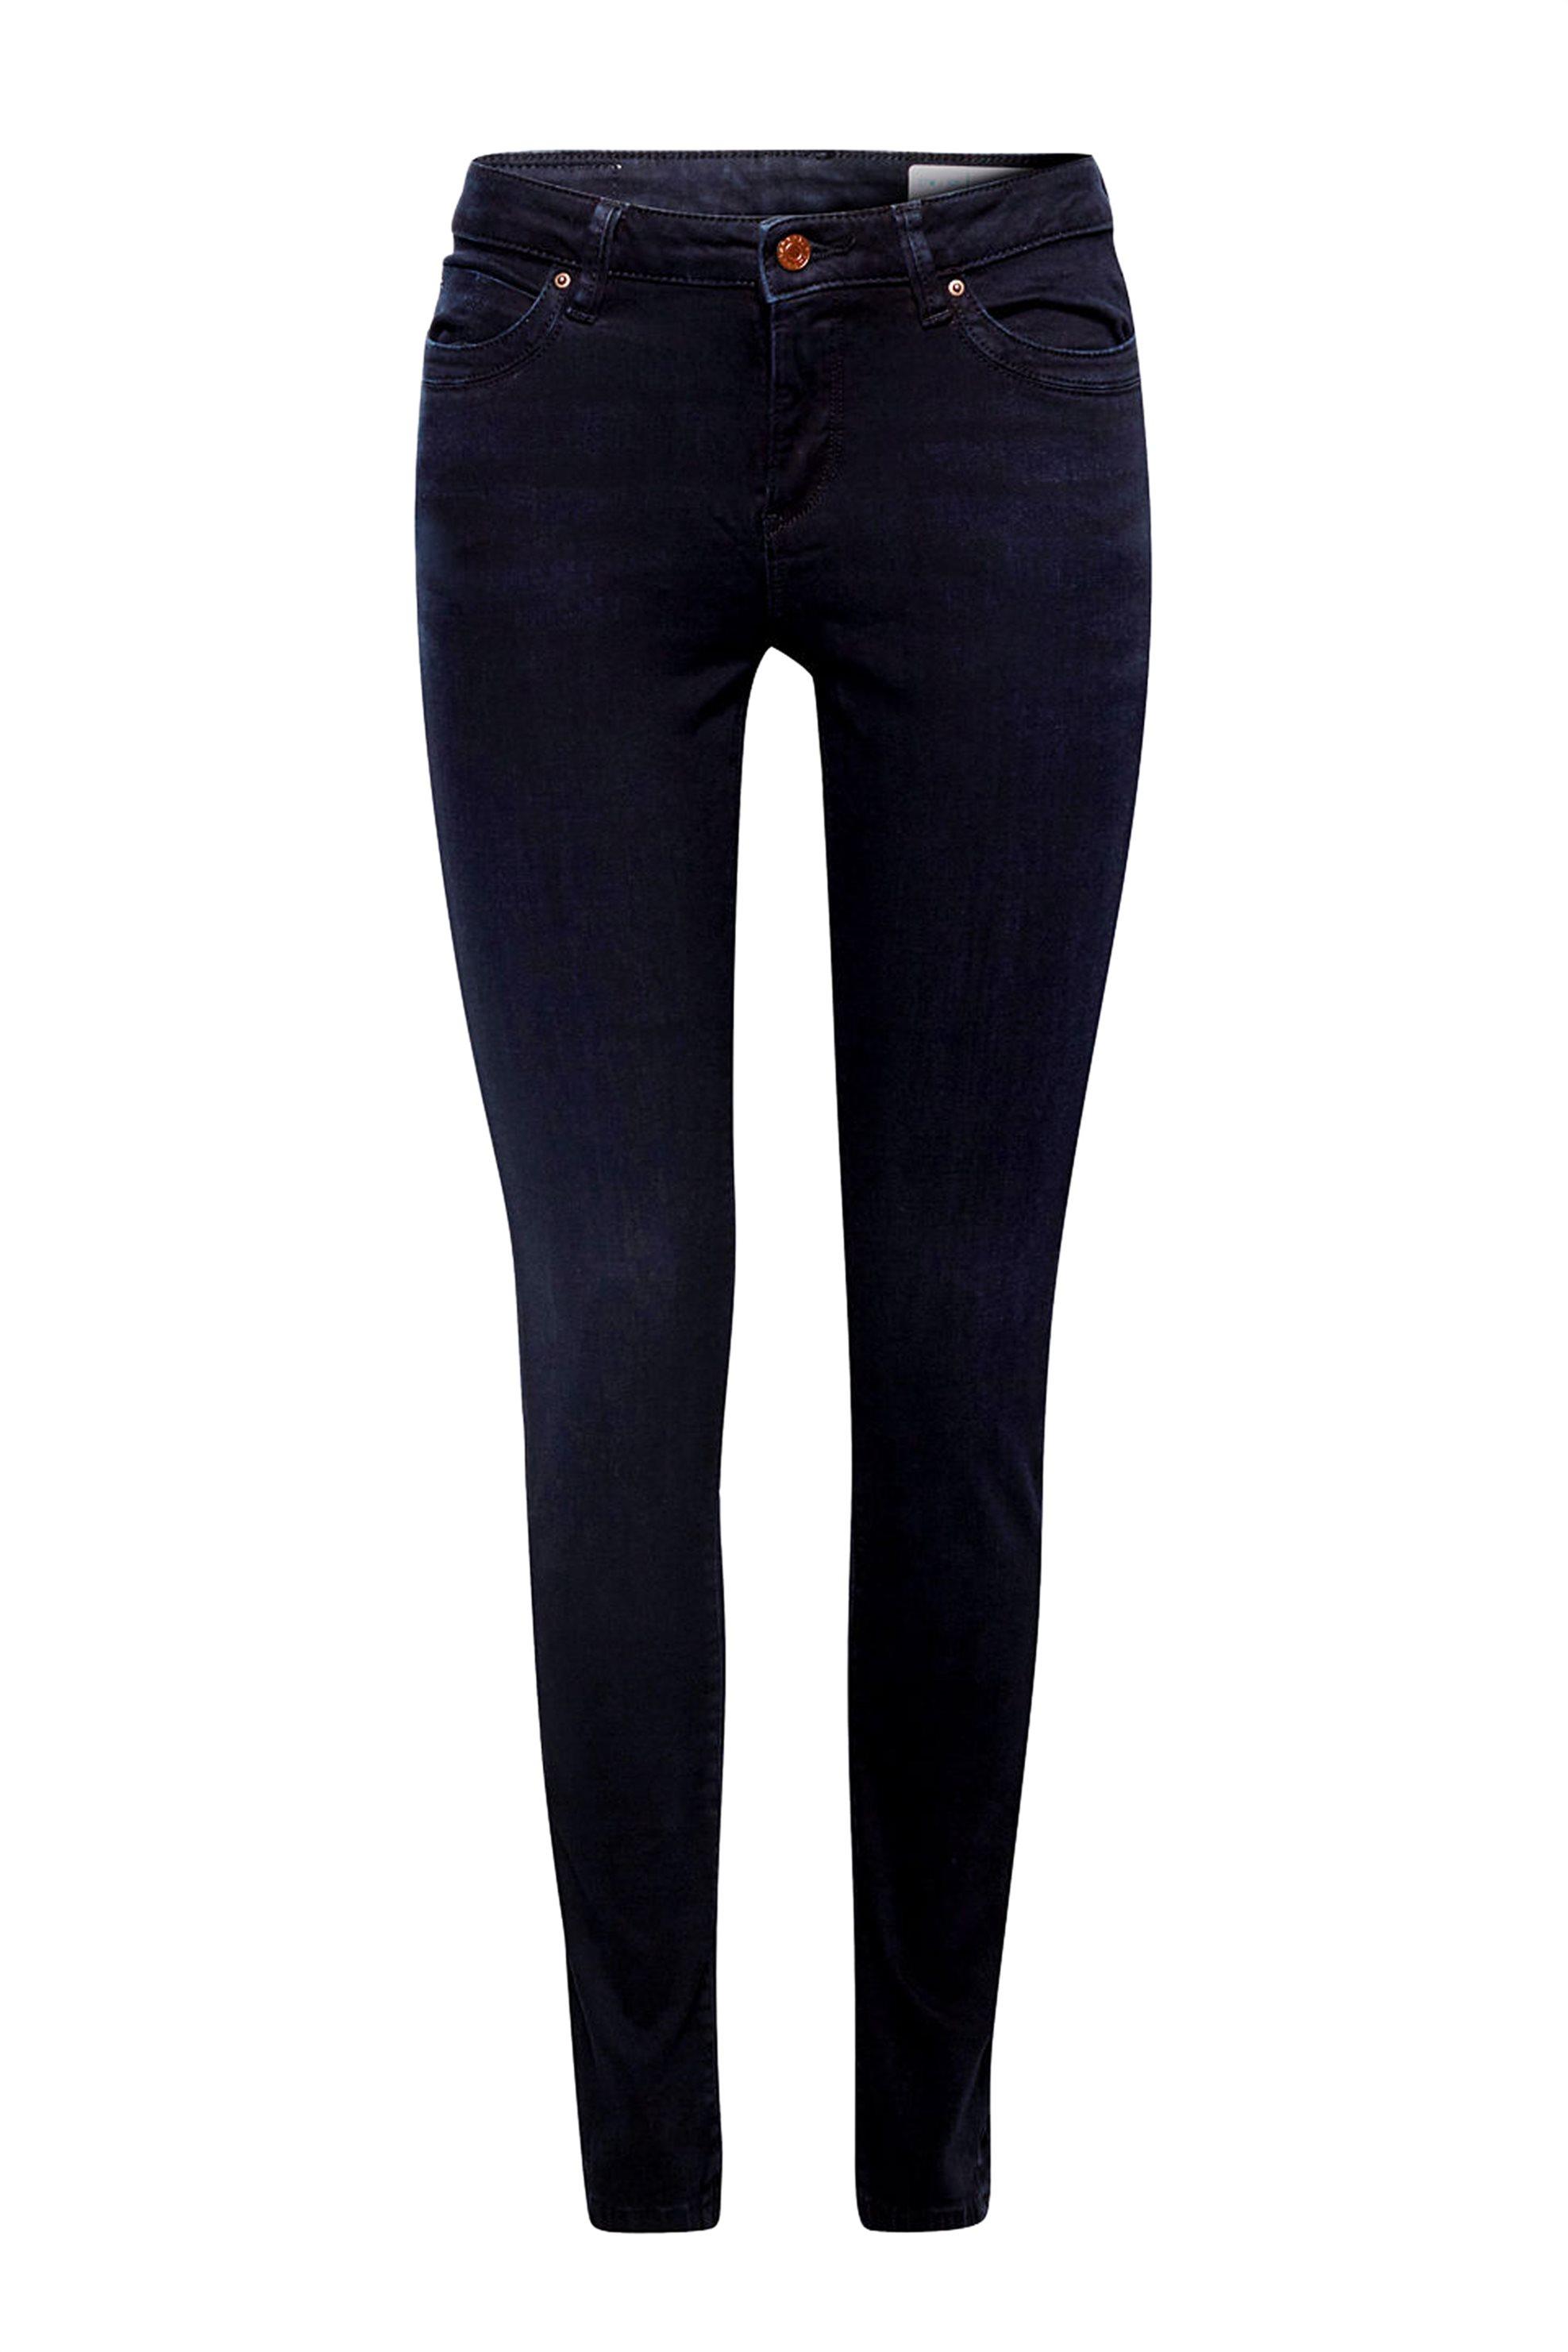 Esprit γυναικείο τζην παντελόνι skinny ελαστικό - 998EE1B811 - Μπλε Σκούρο 819562ea082